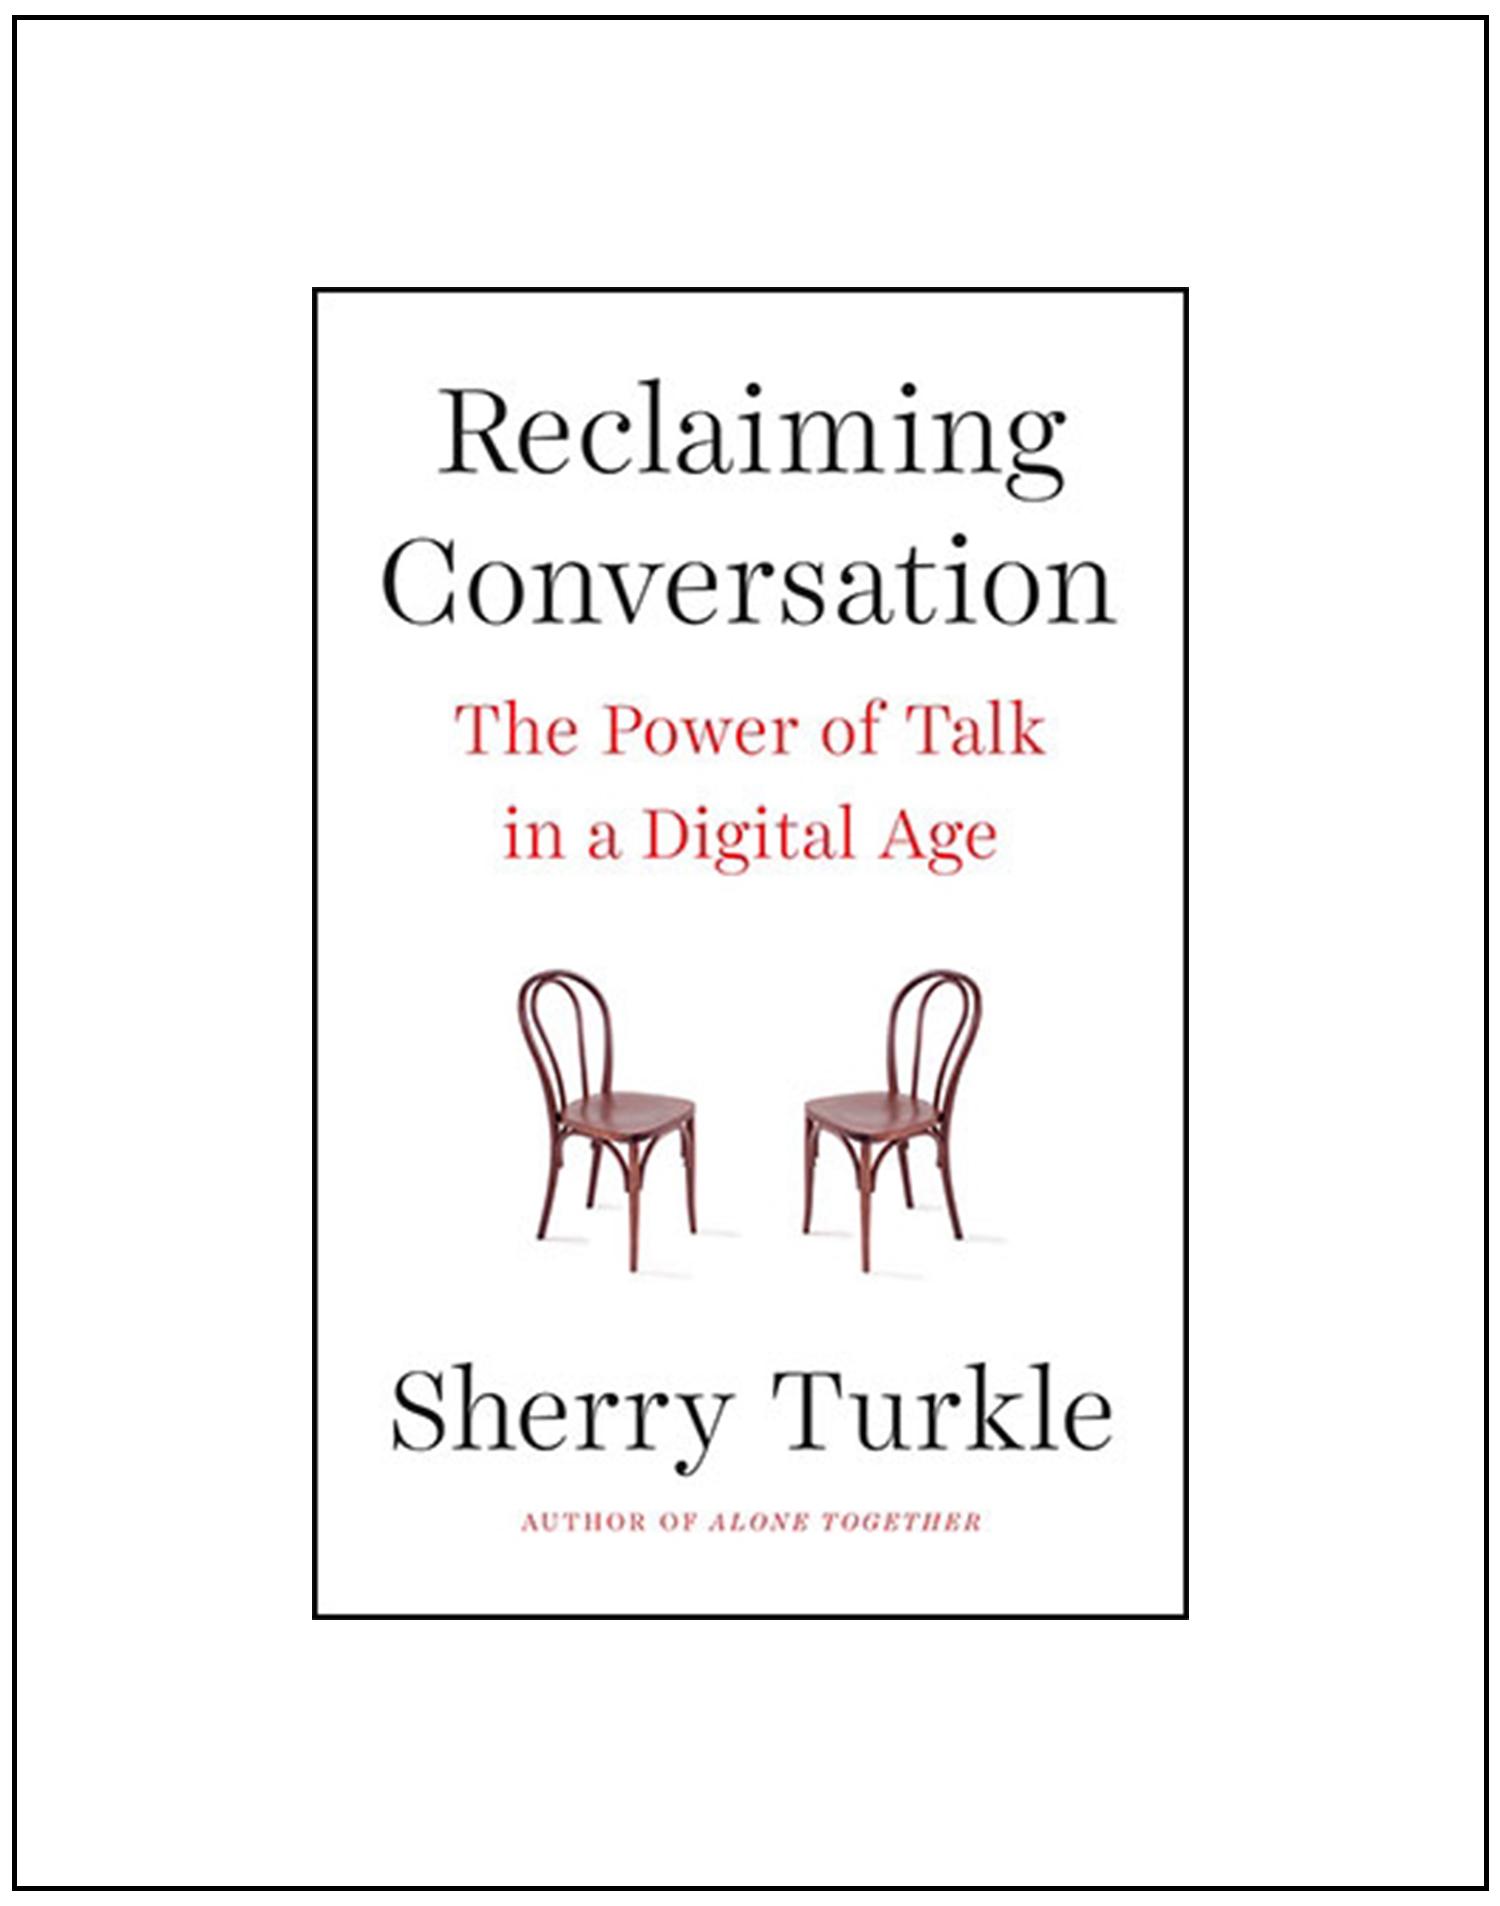 Reclaiming Conversation